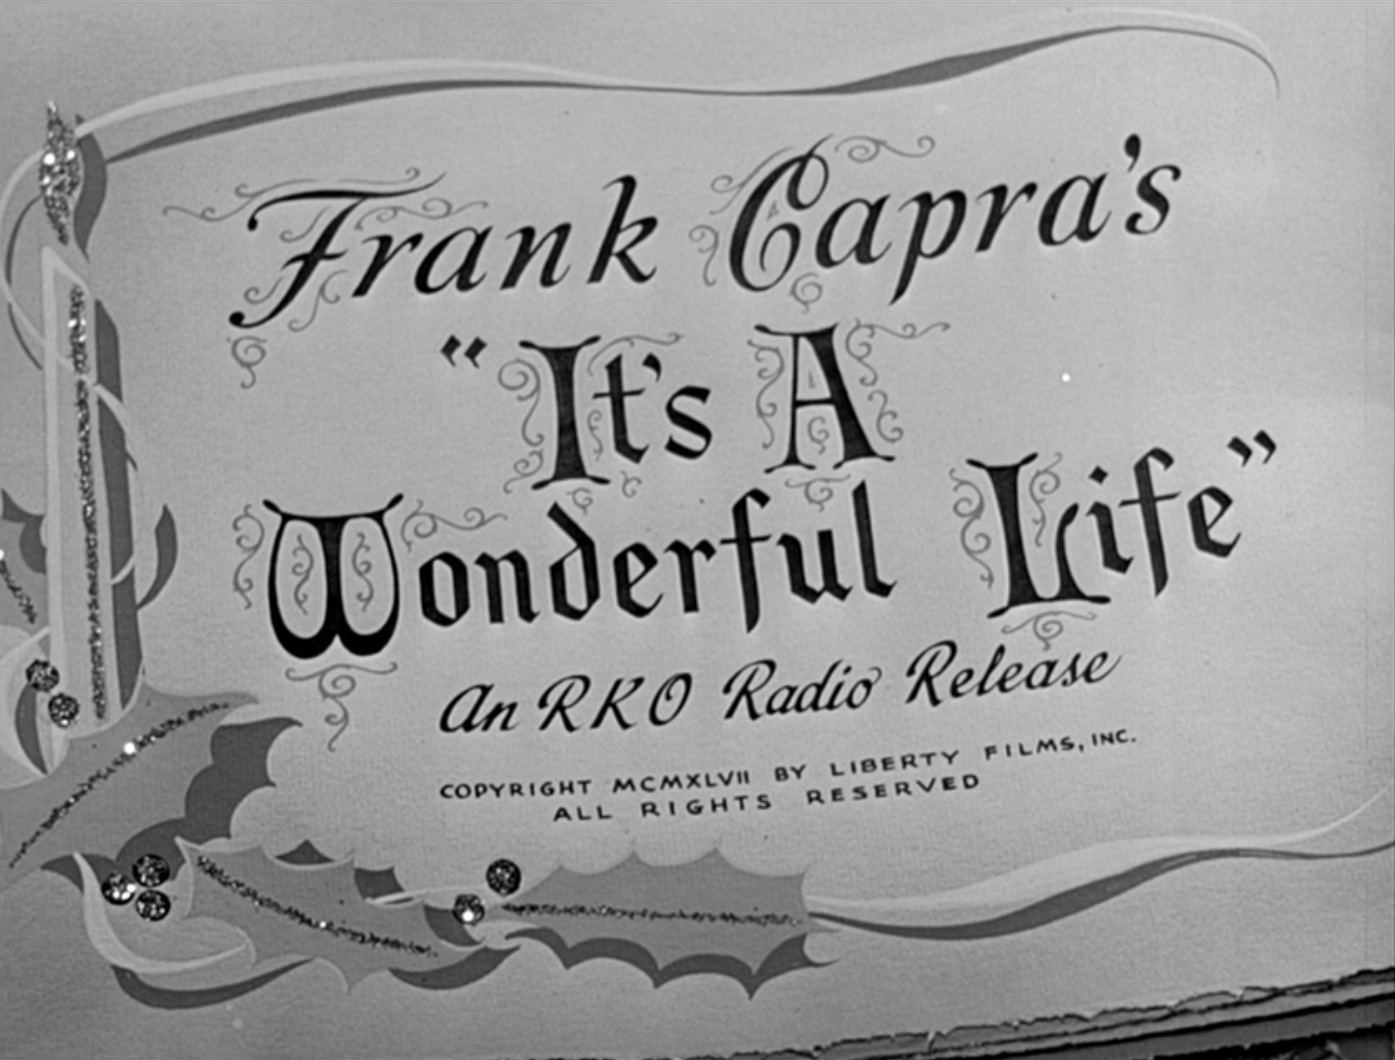 CAPRA_1946_It-s_a_Wonderful_Life.jpg